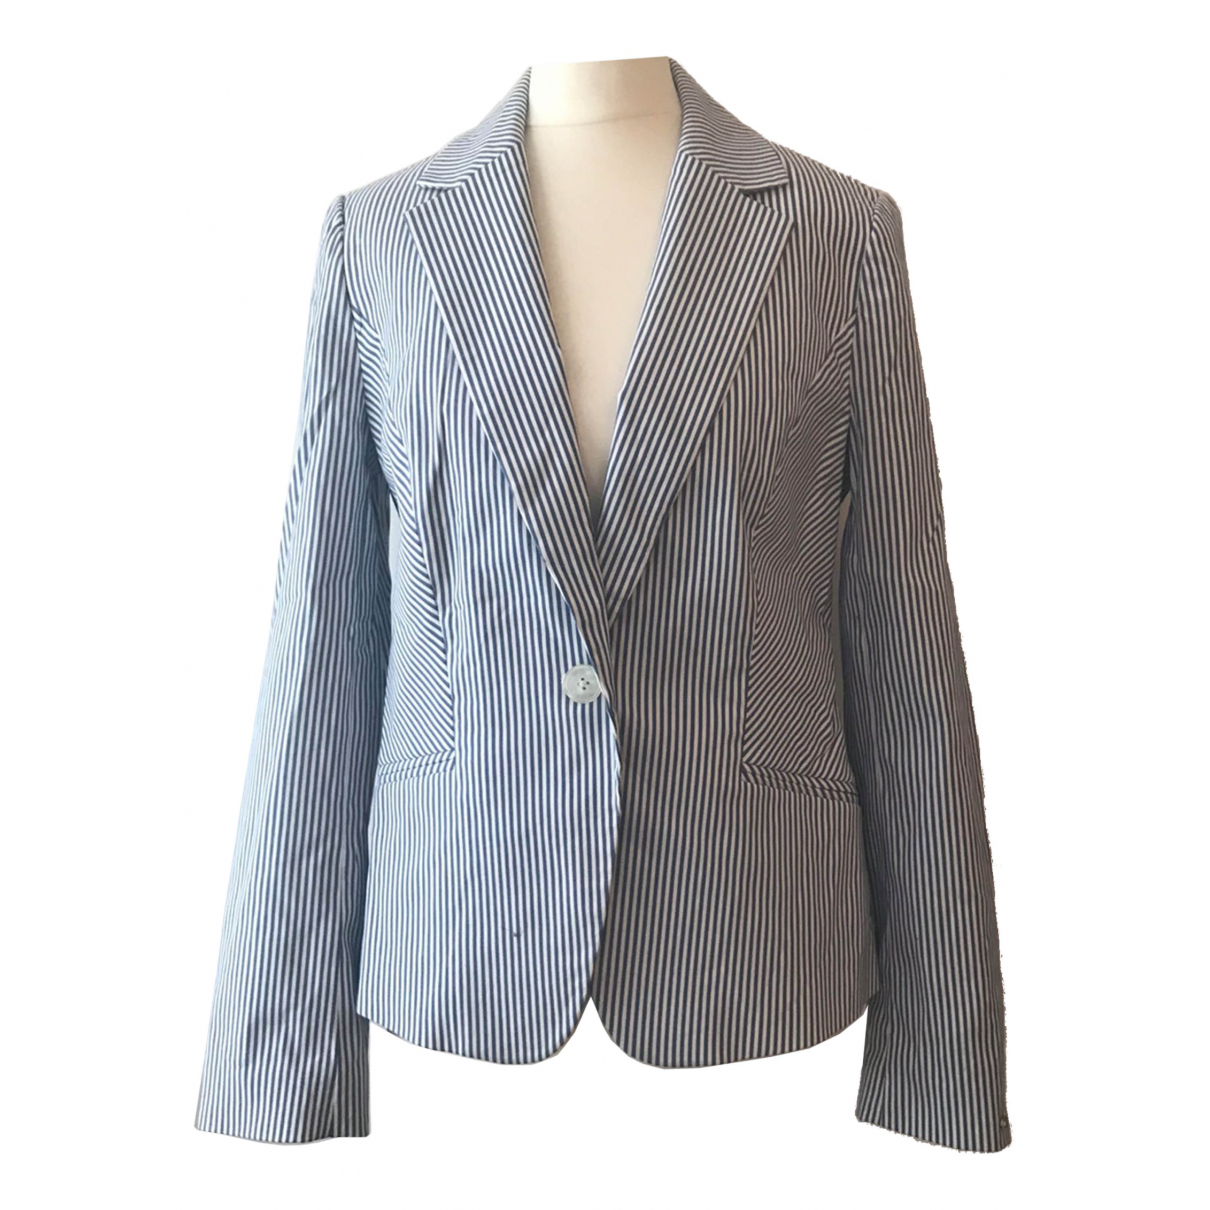 Tommy Hilfiger \N Blue Cotton jacket for Women 8 US